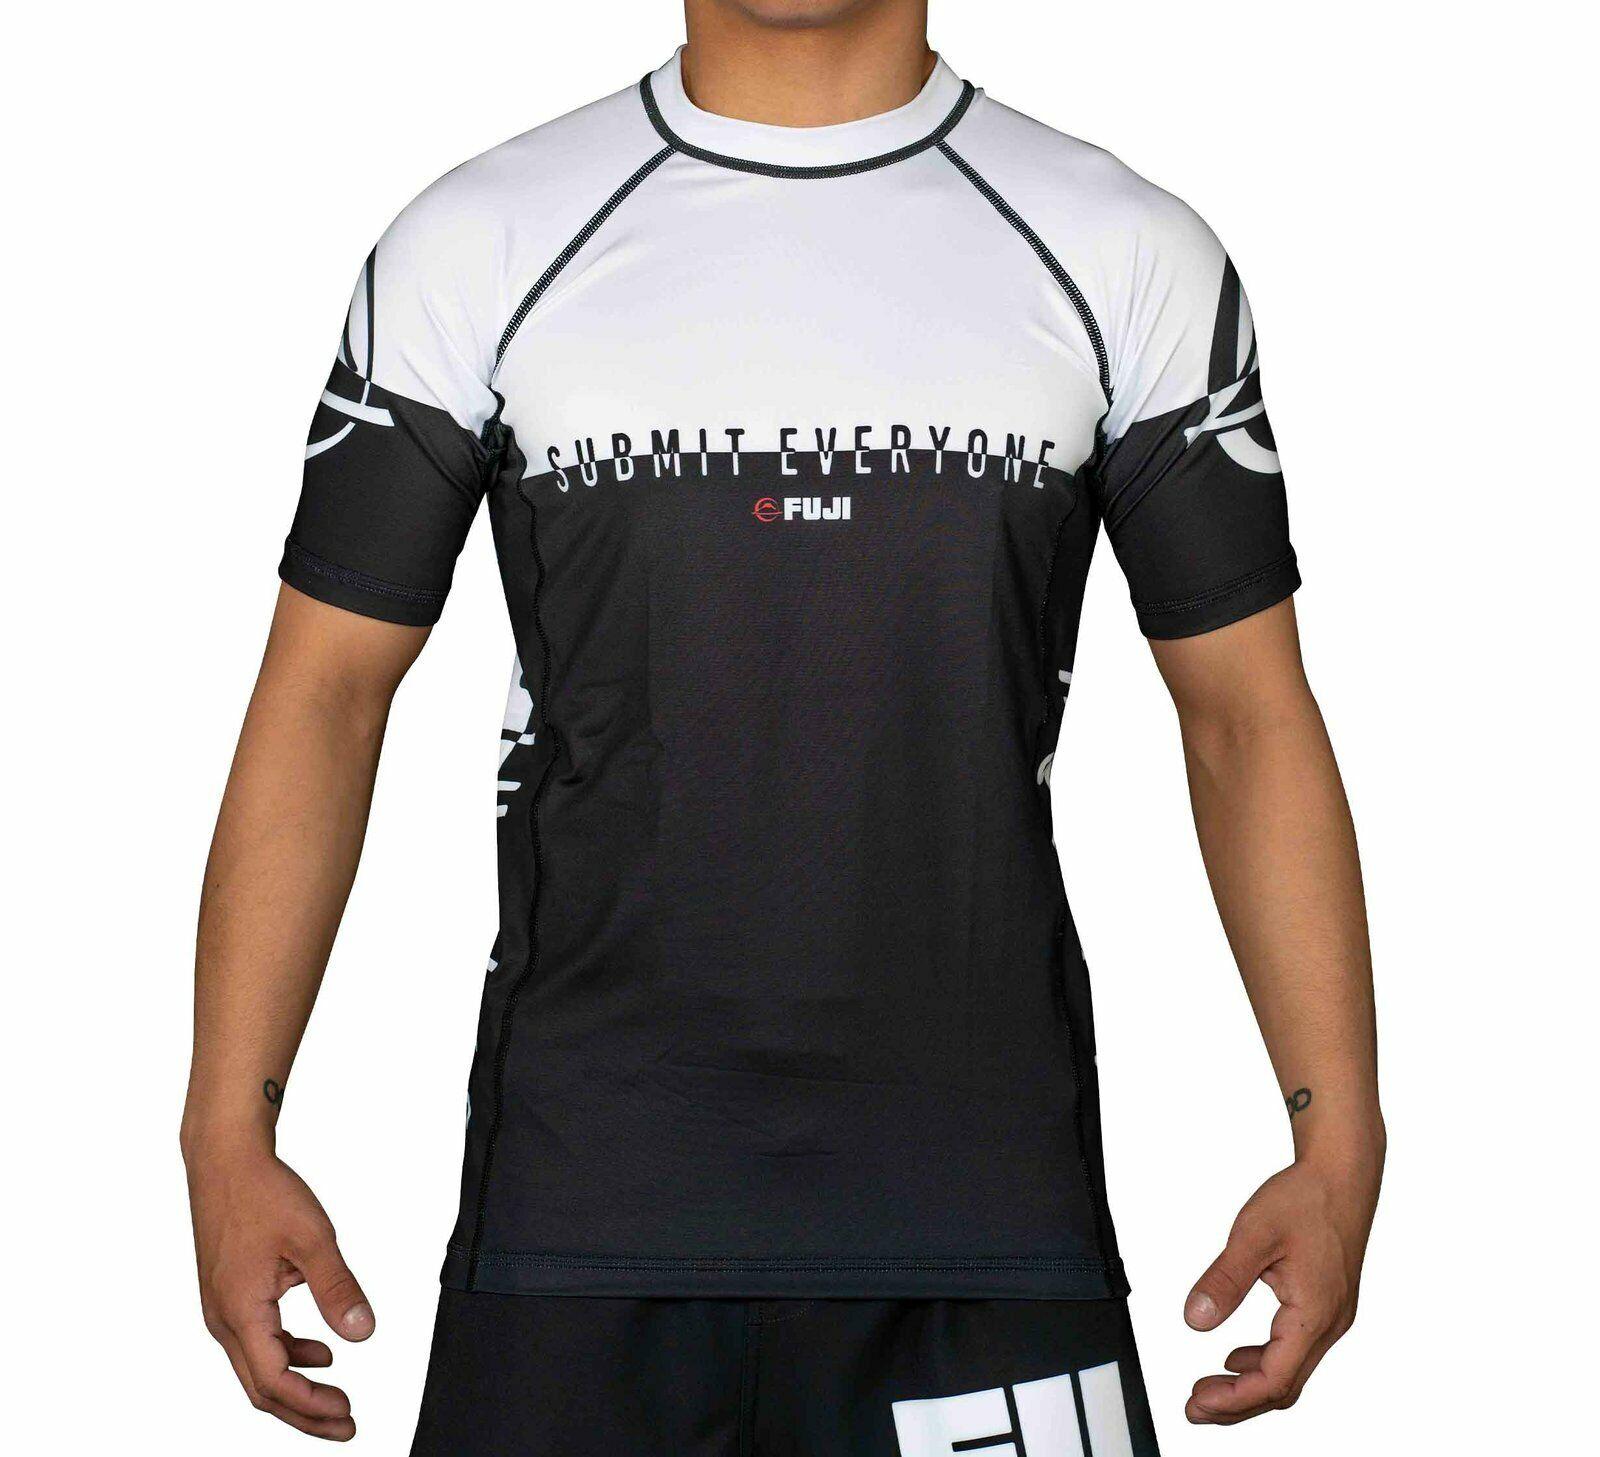 Fuji Sports Submit Everyone MMA BJJ Jiu Jitsu ShortSleeve SS